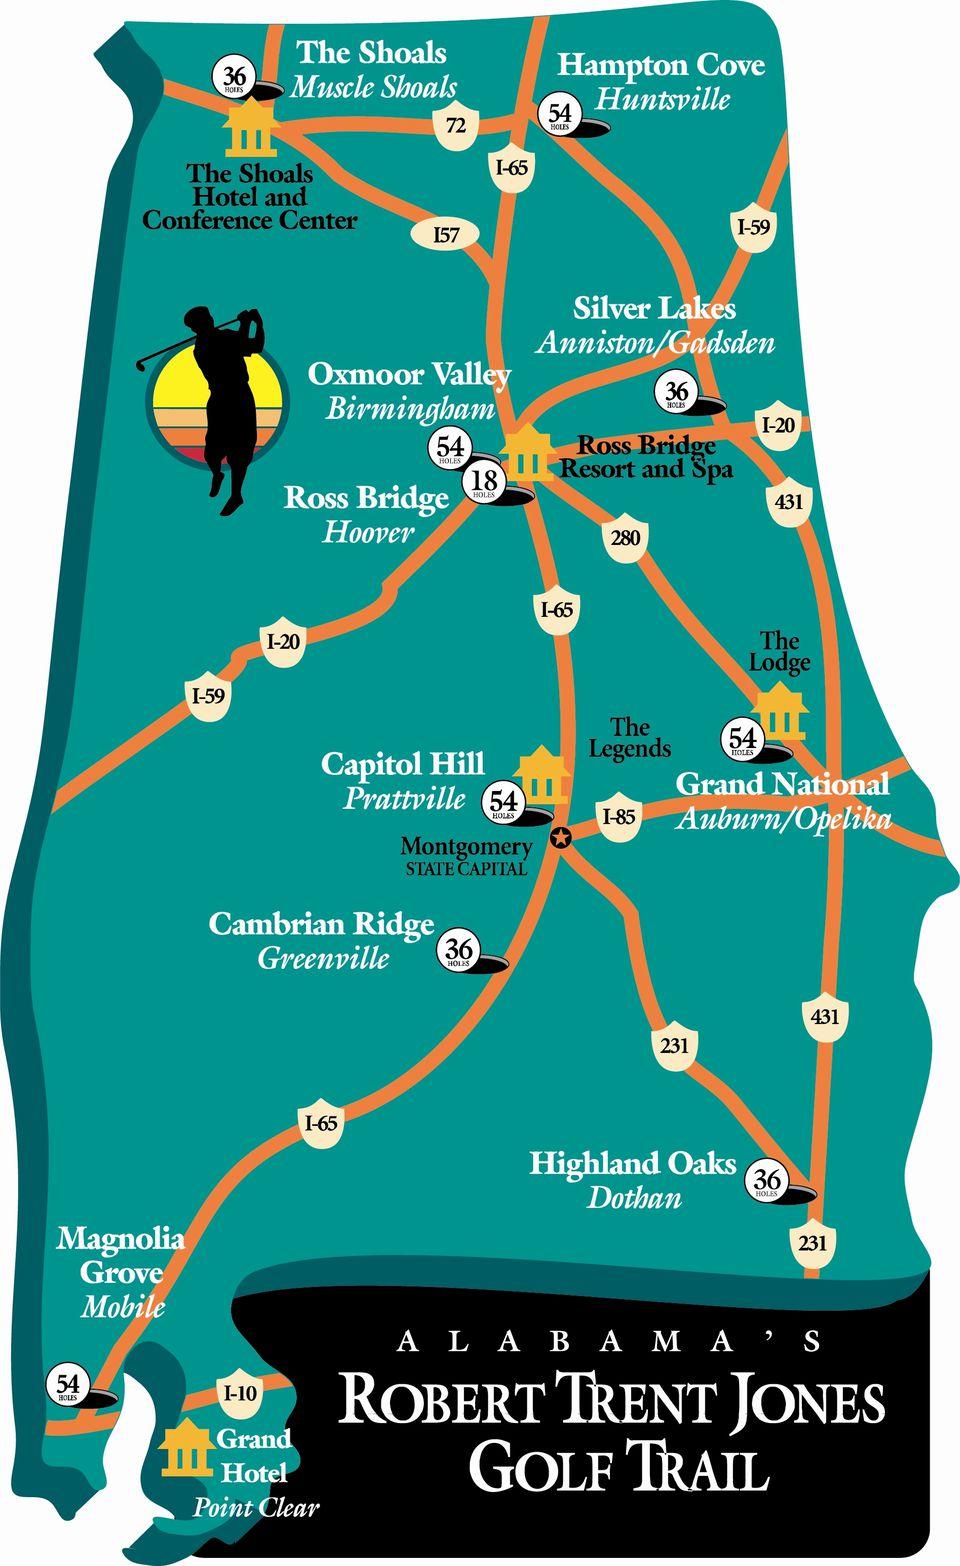 Map of the Robert Trent Jones Golf Trail